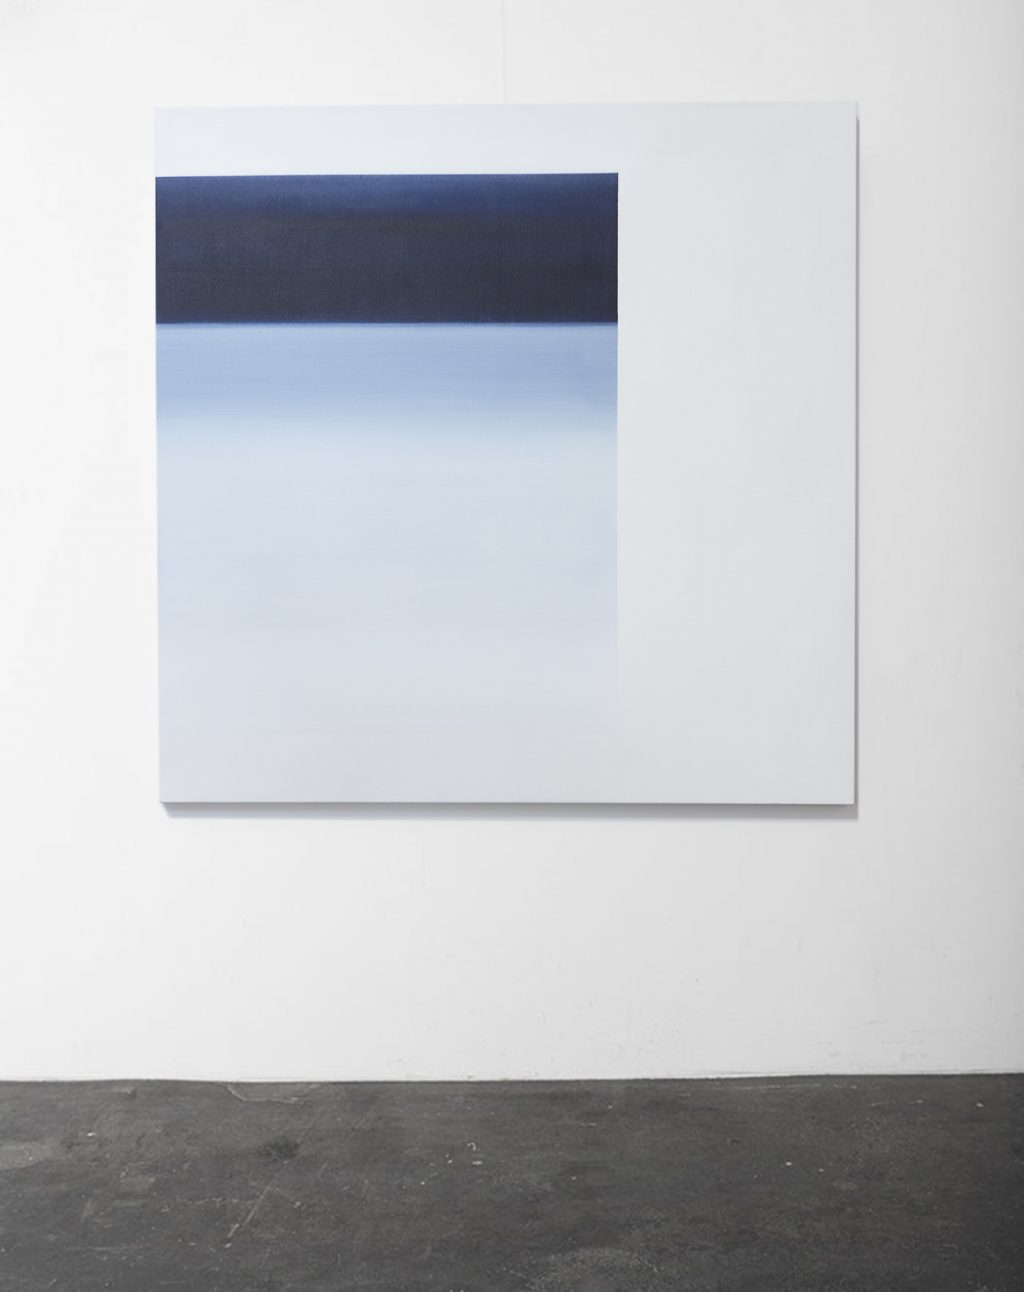 Untitled #36 – 2015